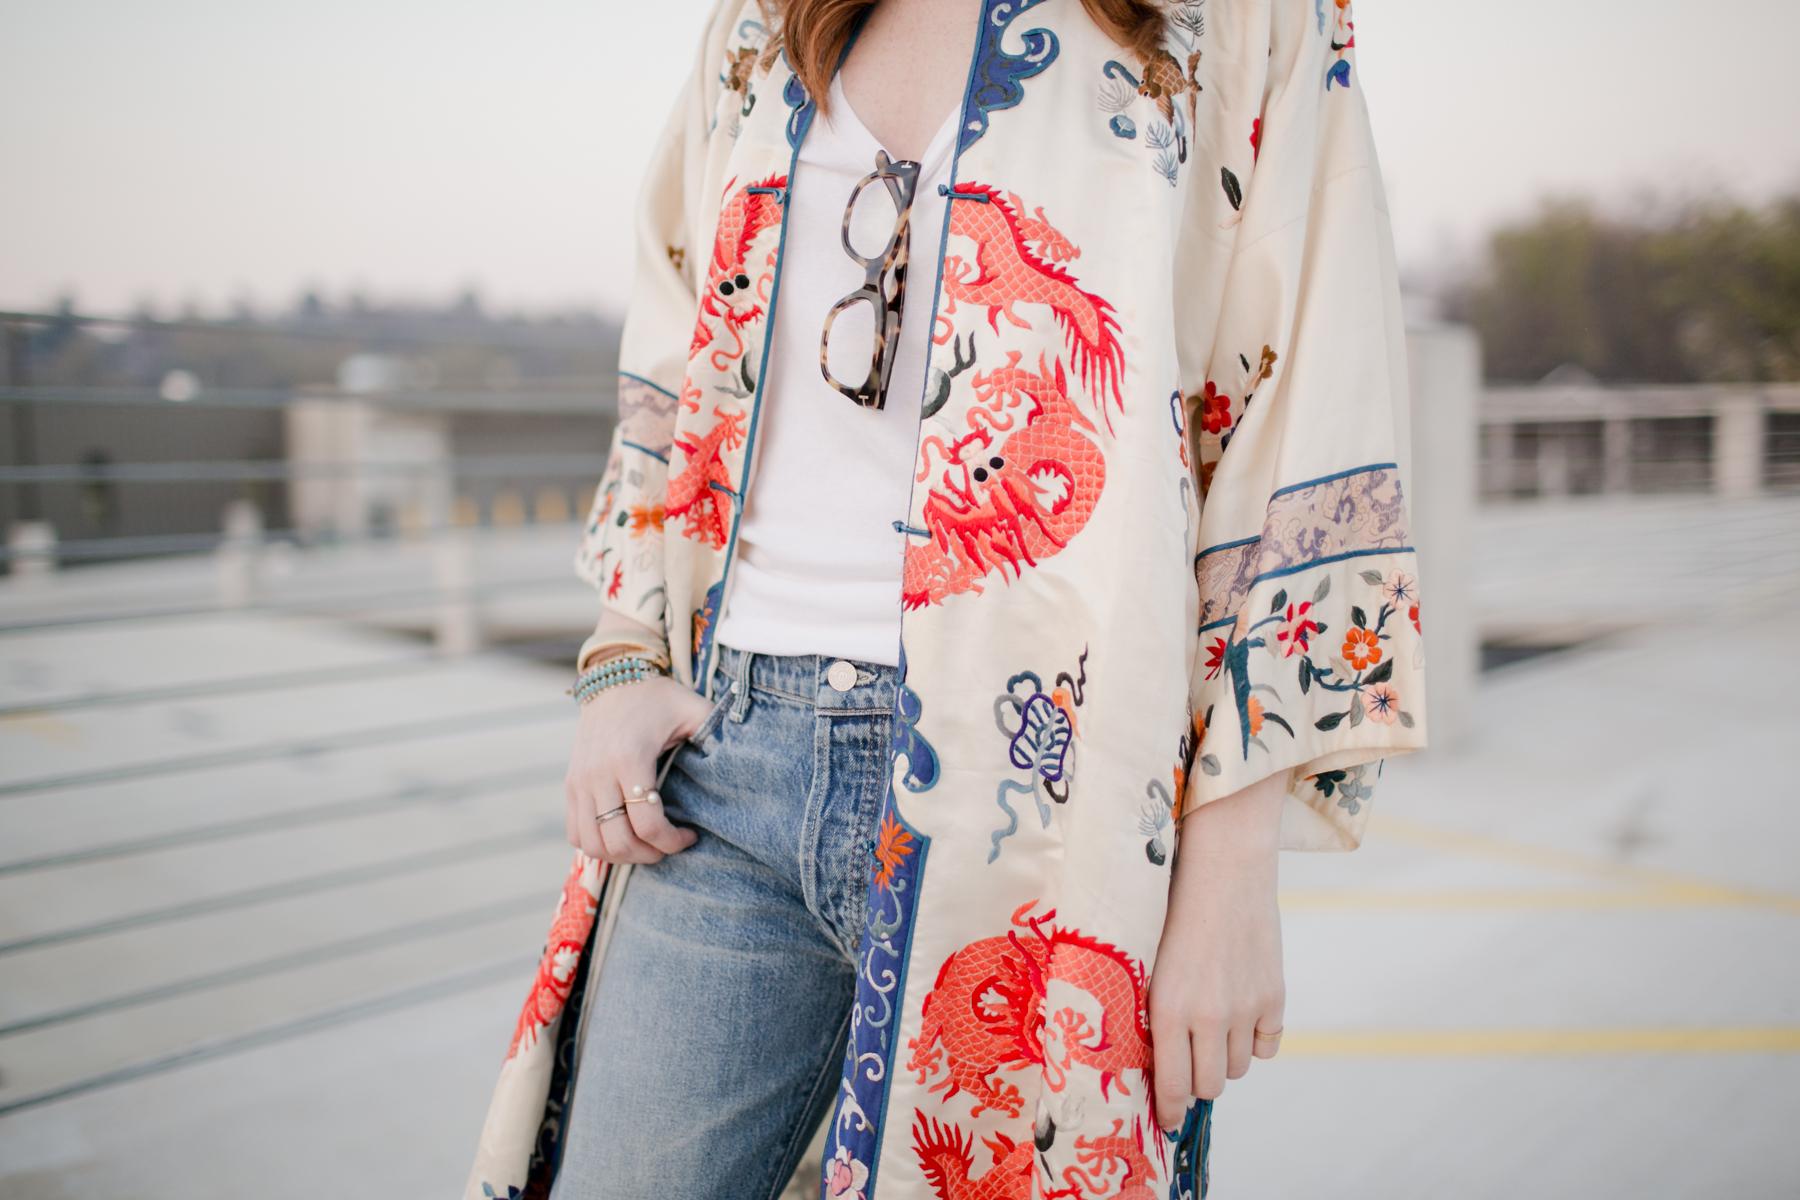 Eldridge_Edit_Anna_E_Cottrell_Tulip_Louise_Fashion_Blogger_Kimono_Deconstructed_Oversized_Boyfriend_Jean_Denim_Mother-White_T-shirt_Tom_Ford_Glasses_Joie_Heel_16.jpg